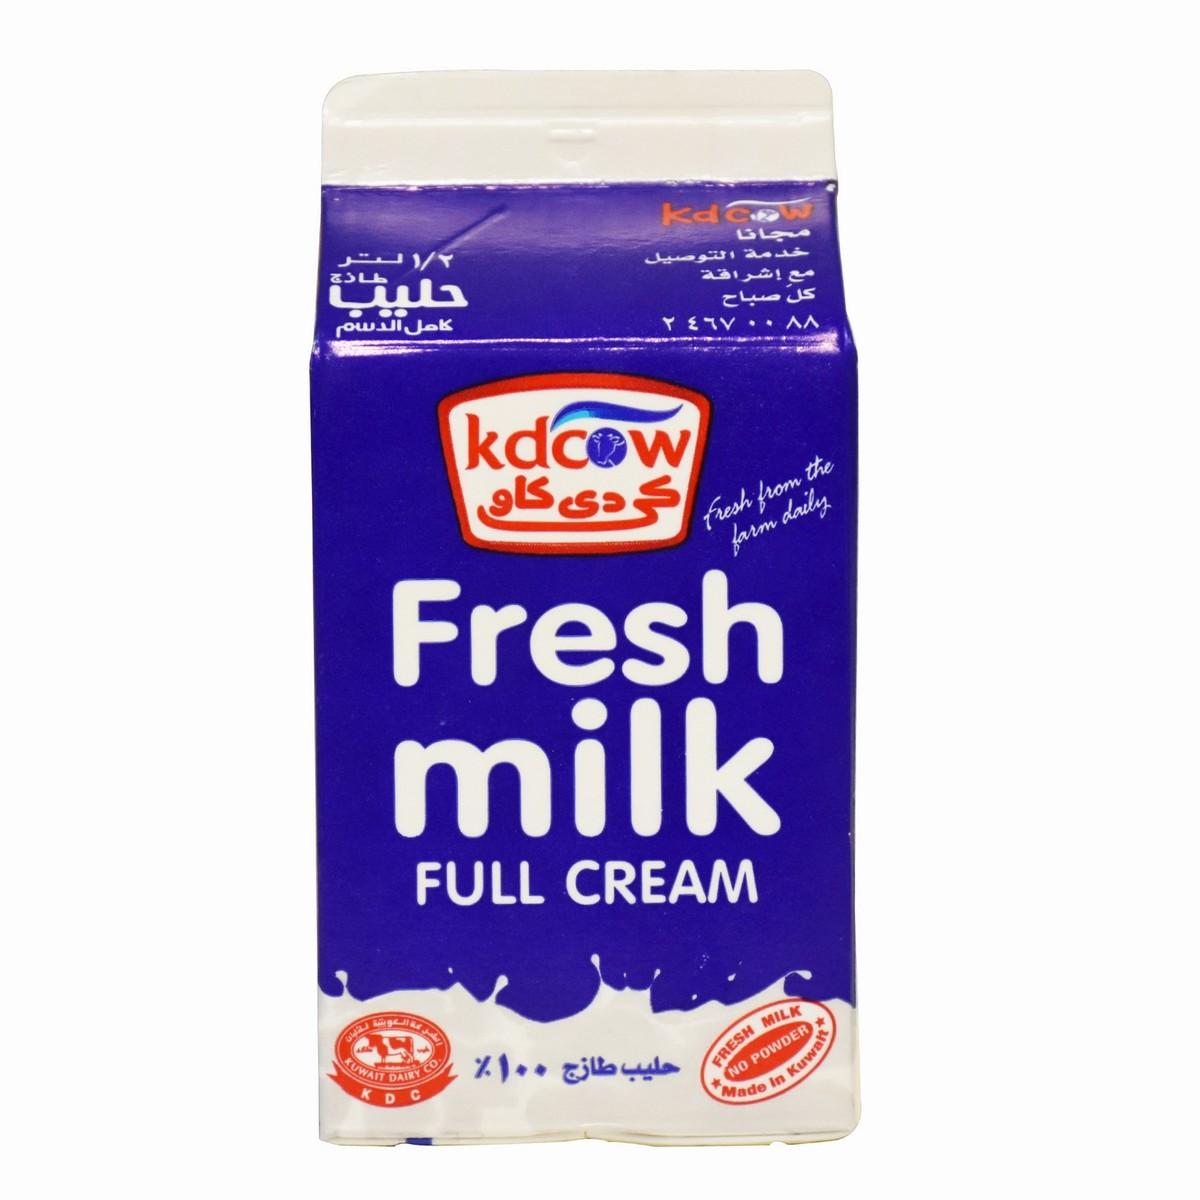 Buy Kdcow Full Cream Fresh Milk 500ml - Fresh Milk - Lulu